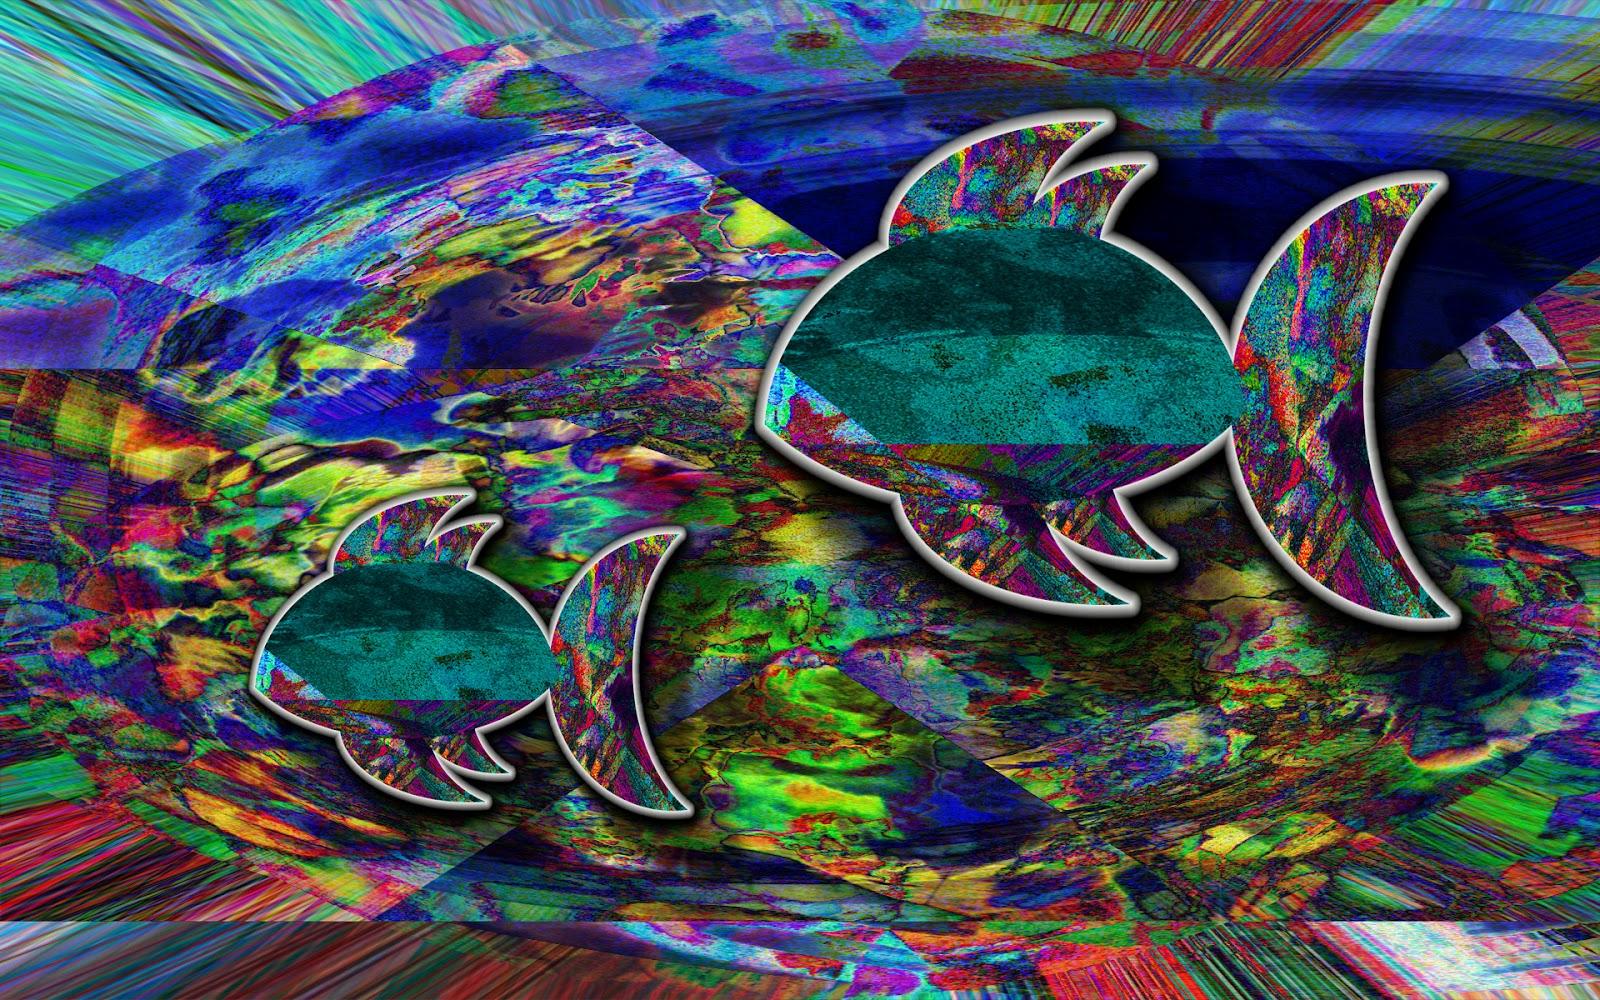 Triipy clipart desktop background Wallpaper bp whae wallpaper blogspot